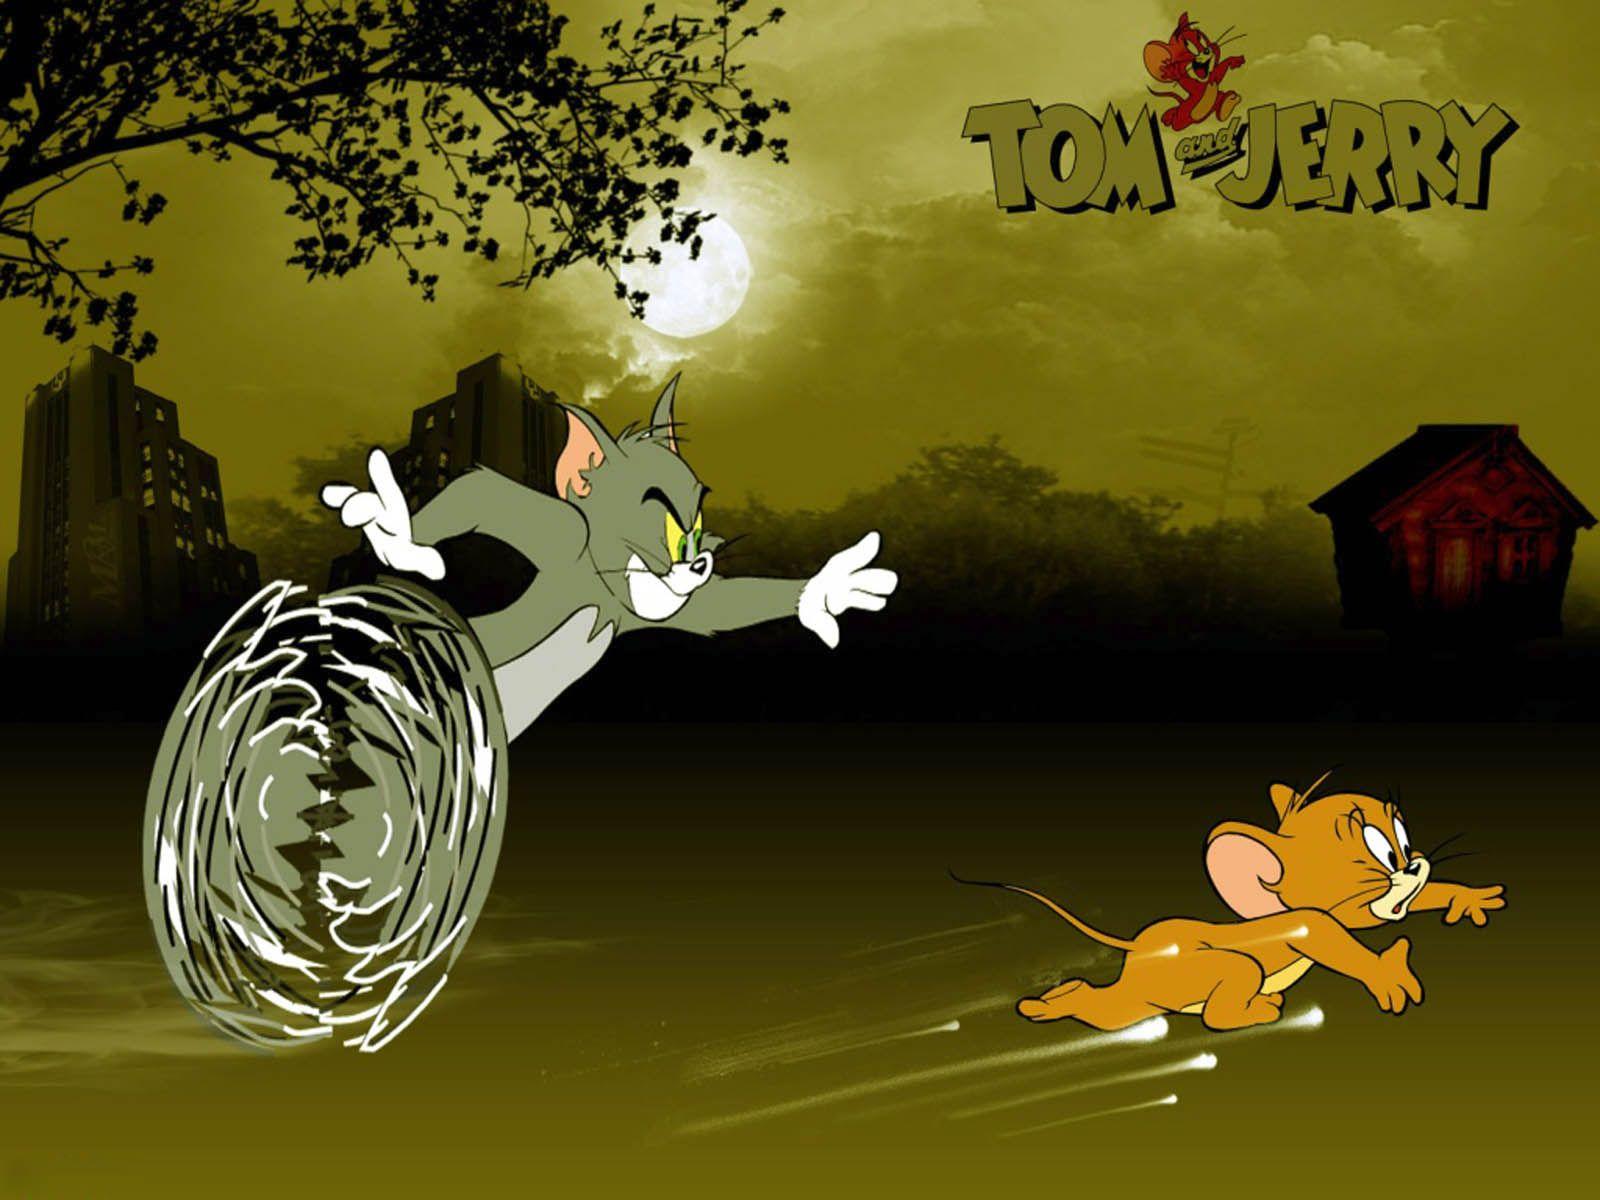 Tom Jerry Wallpaper Desktop Http Wallpaperazzinet 2015 12 15